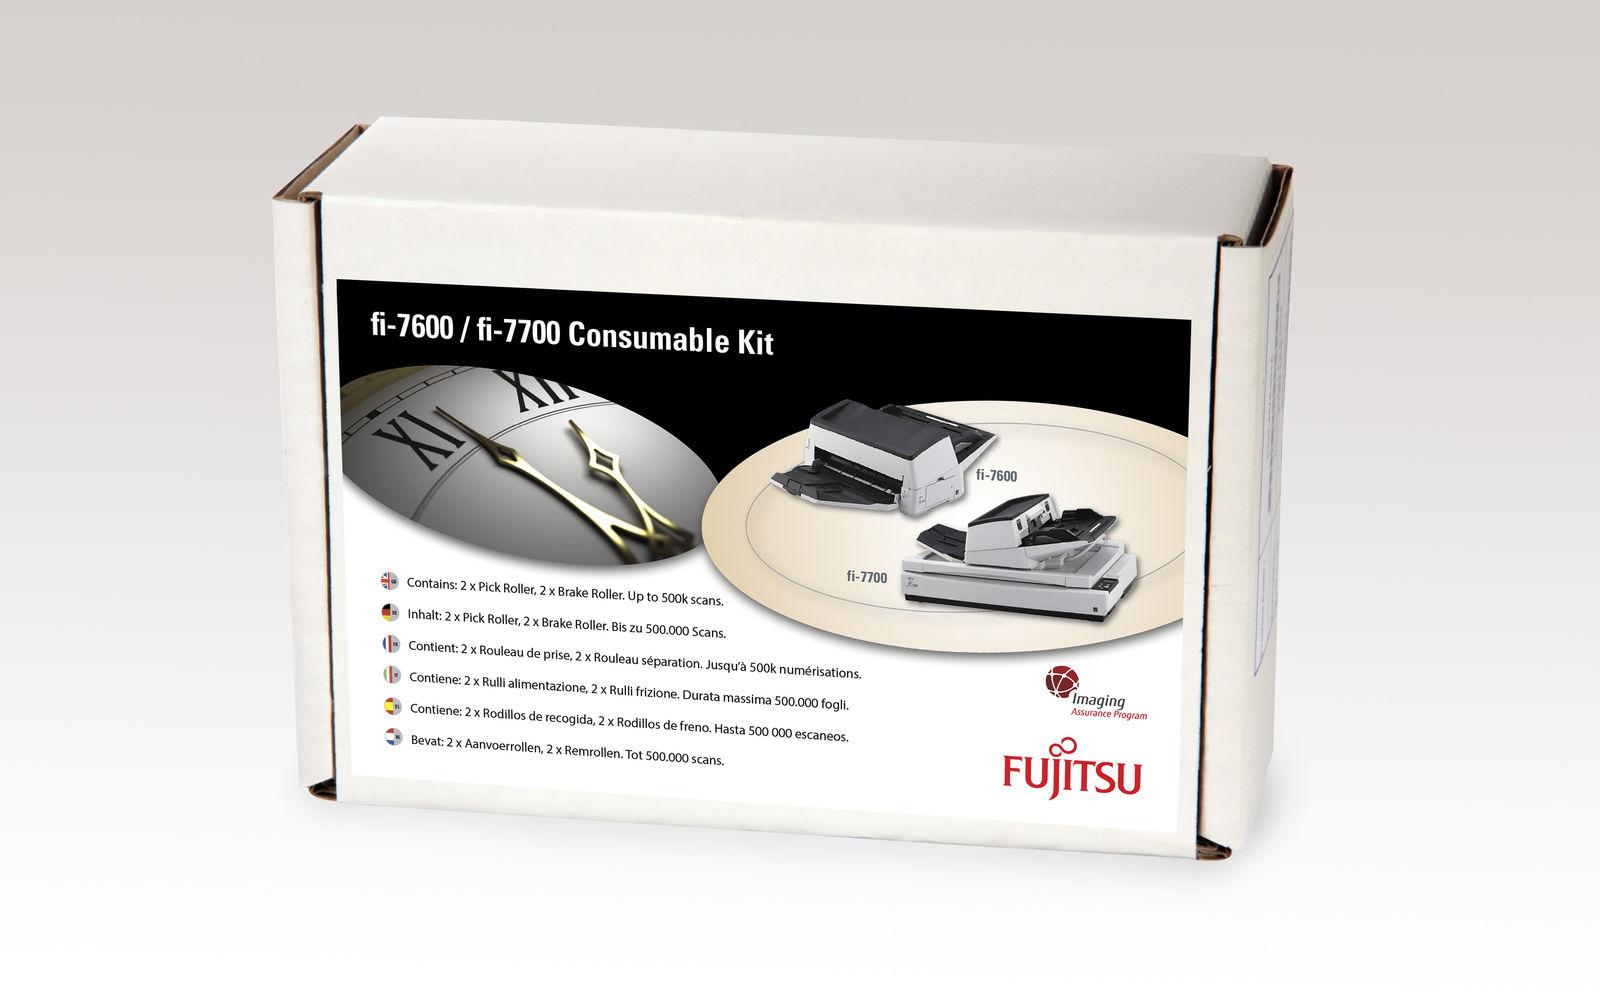 Fujitsu CONSUMABLES KIT FI-7X00 SERIES  CON-3740-002A - eet01